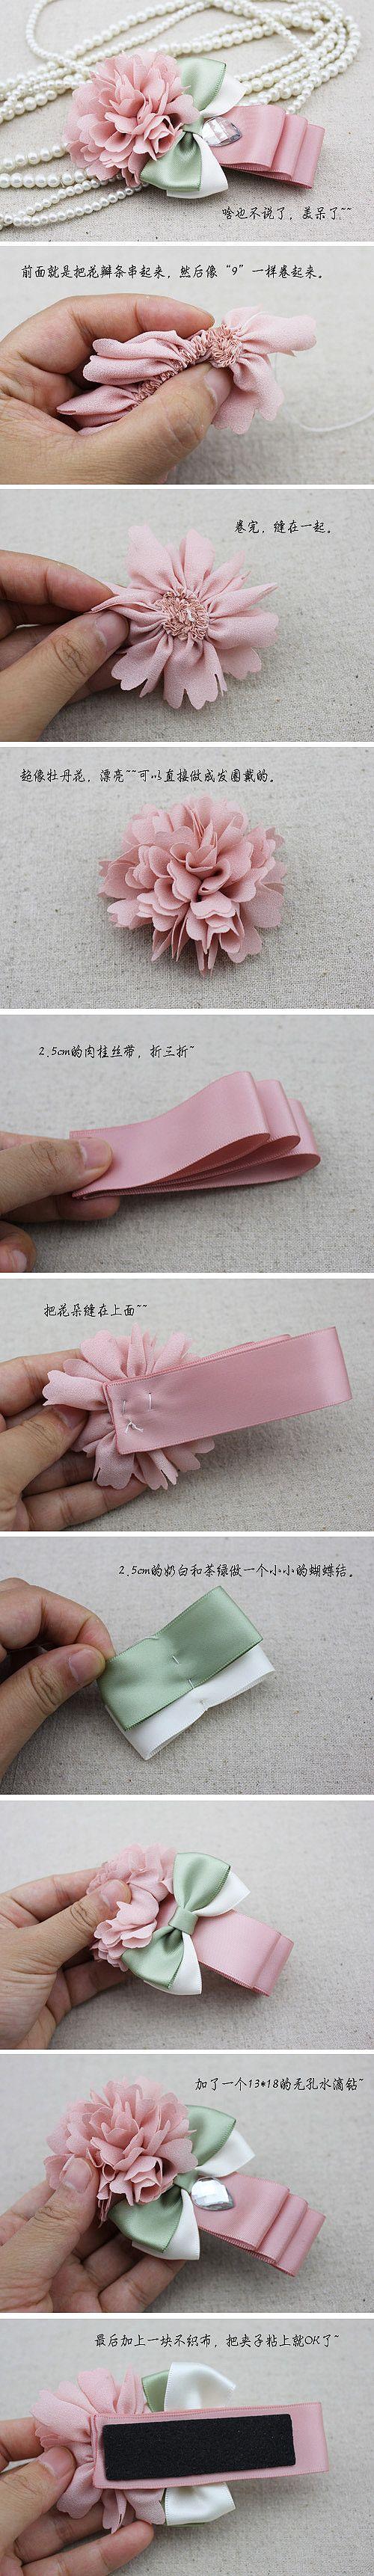 Peony flower hairpin handmade DIY